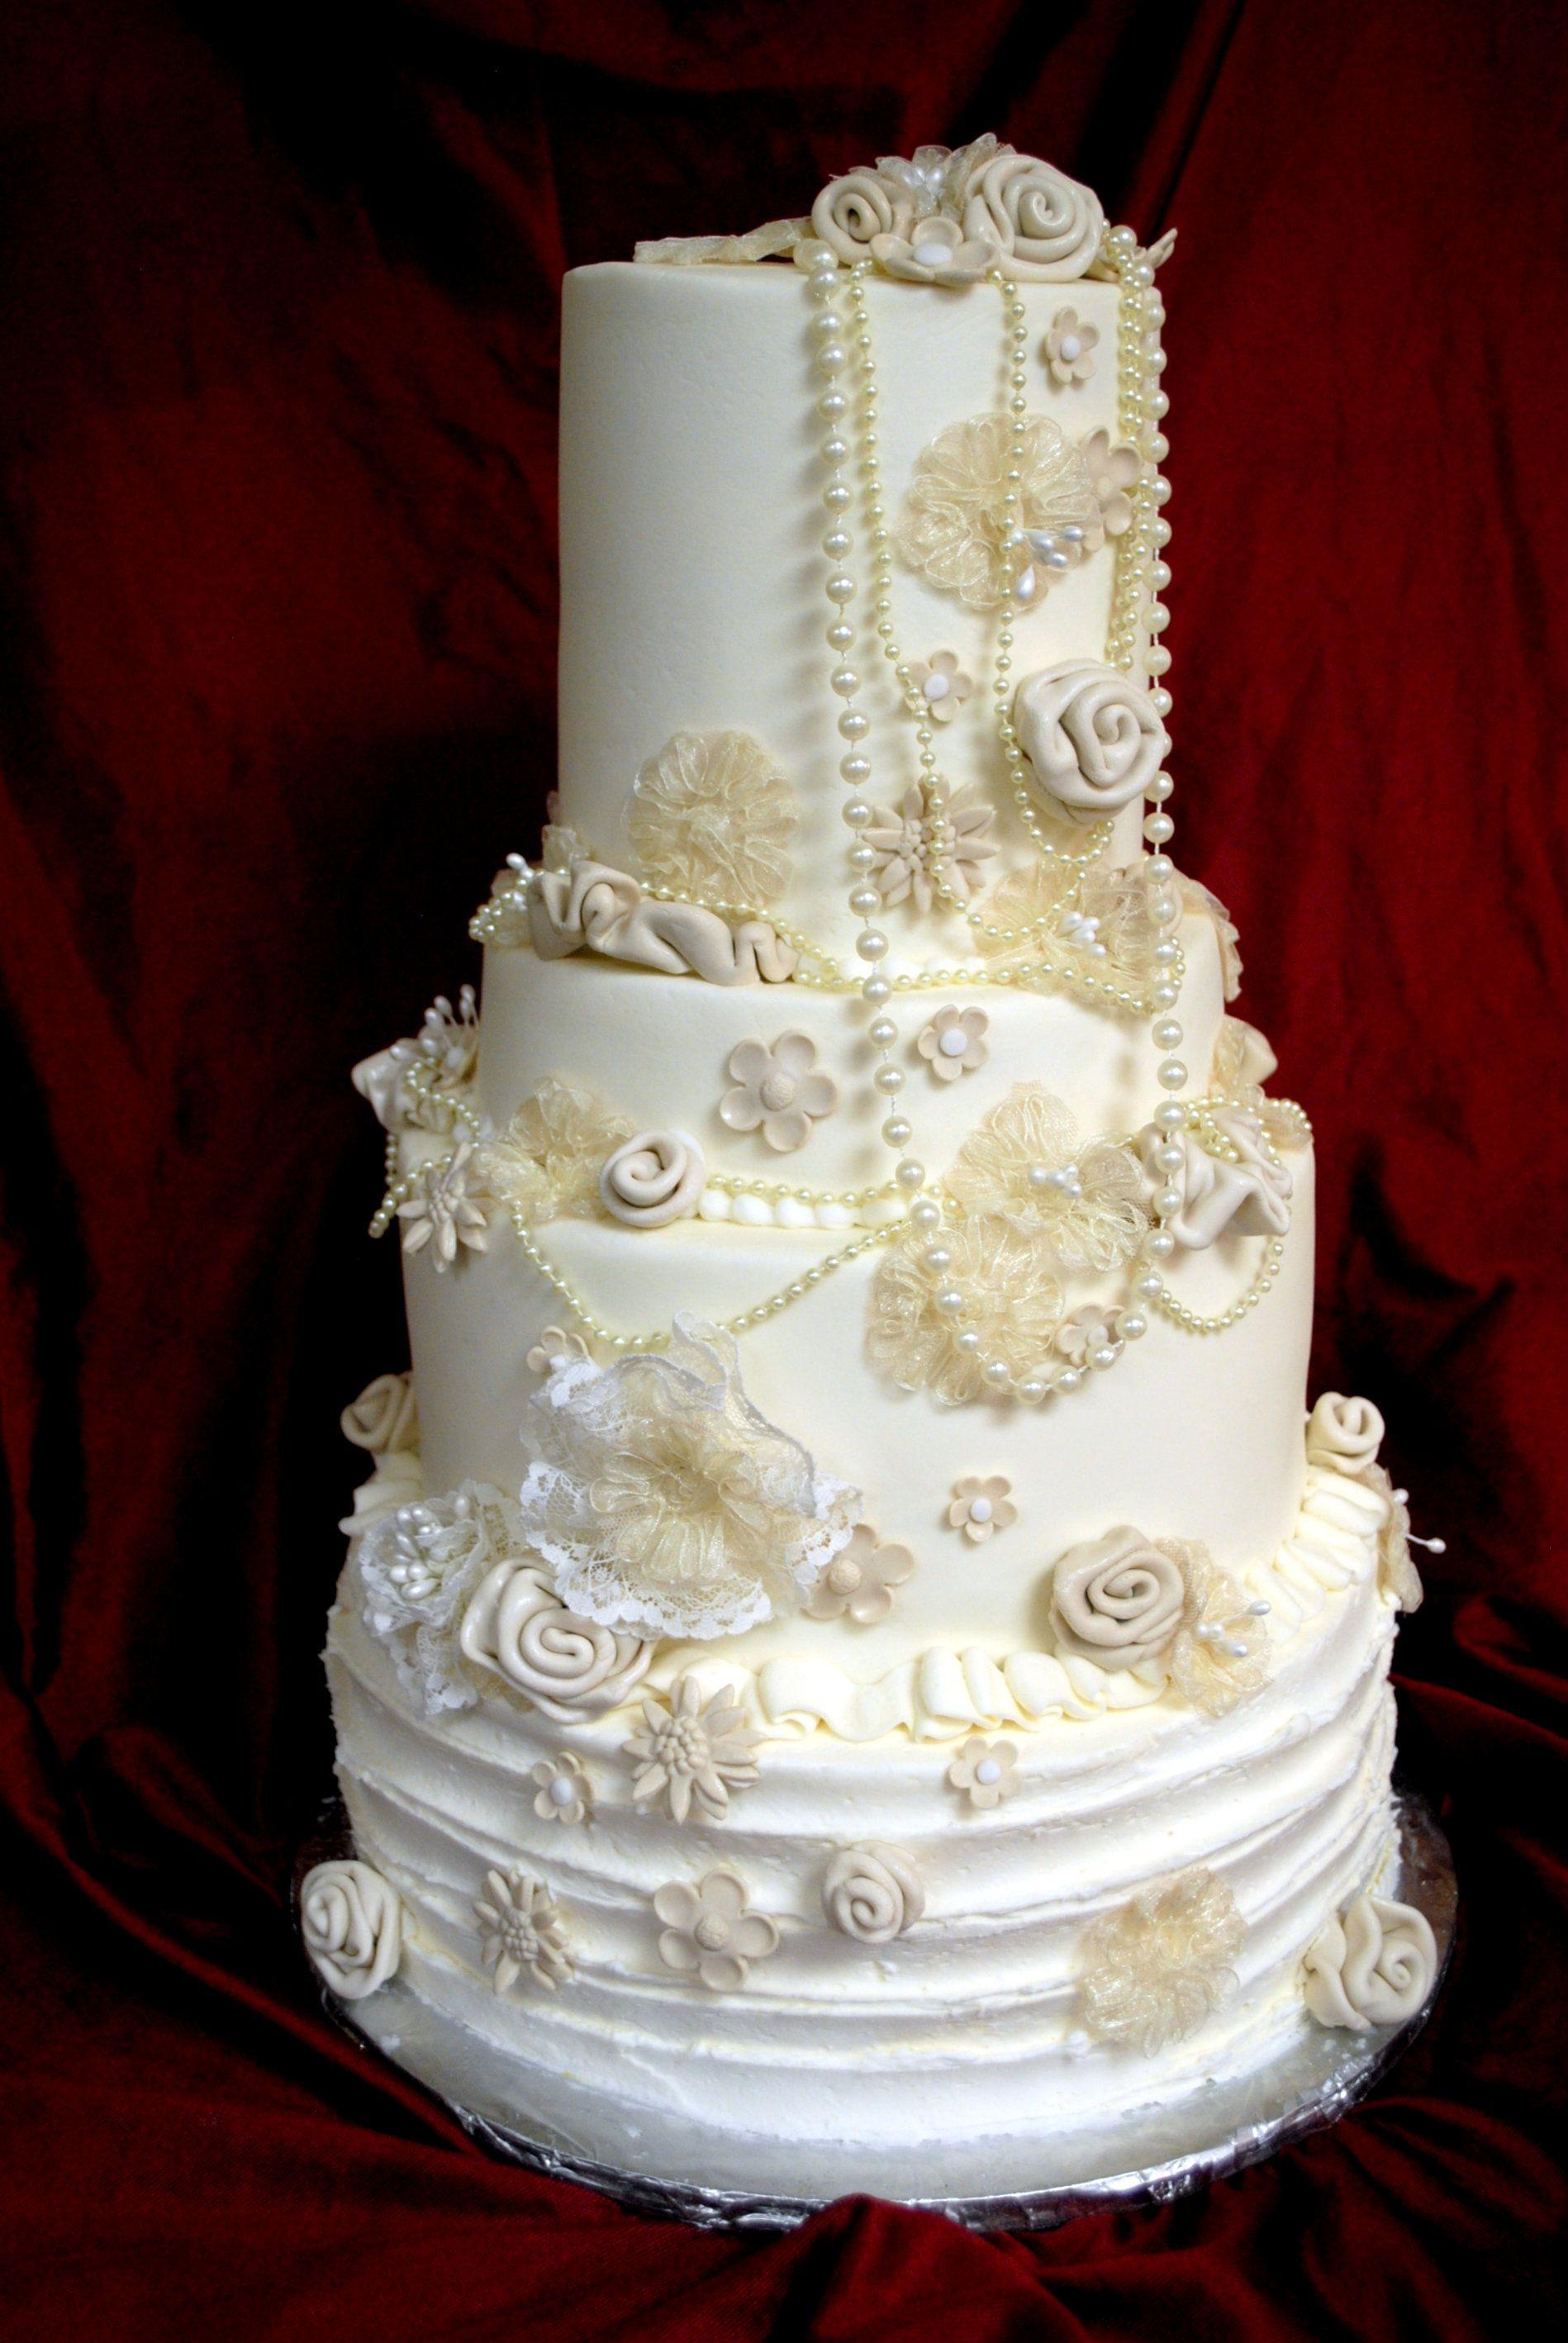 Vintage Wedding Cake   Custom Cakes   Pinterest - photo#12